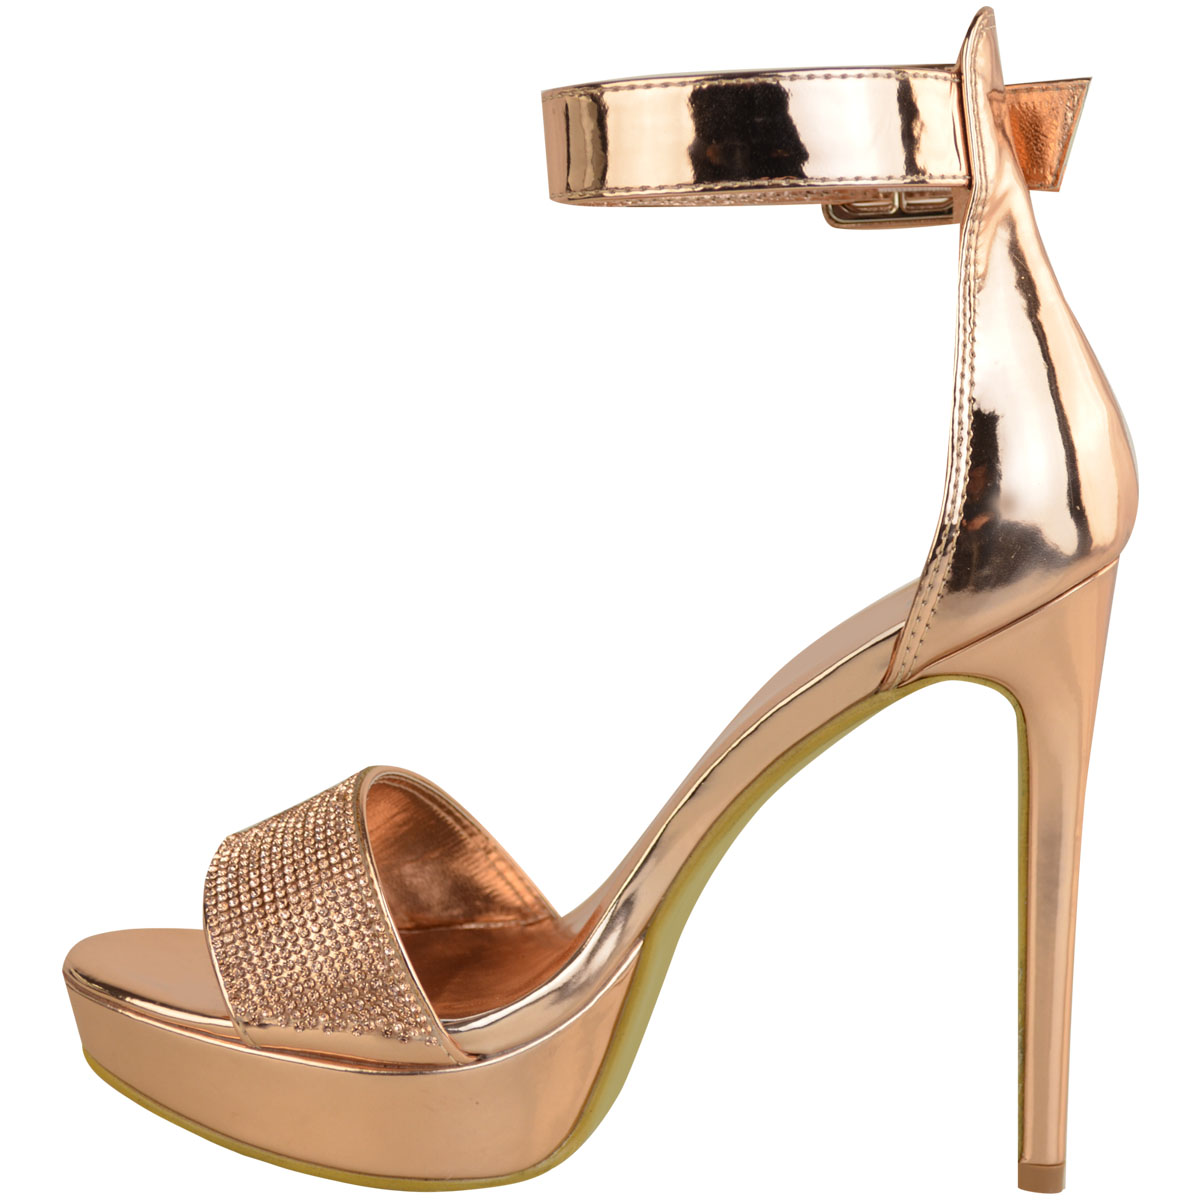 Womens-Ladies-Stilettos-High-Heels-Strappy-Platforms-Sandals-Diamante-Shoes-Size thumbnail 24